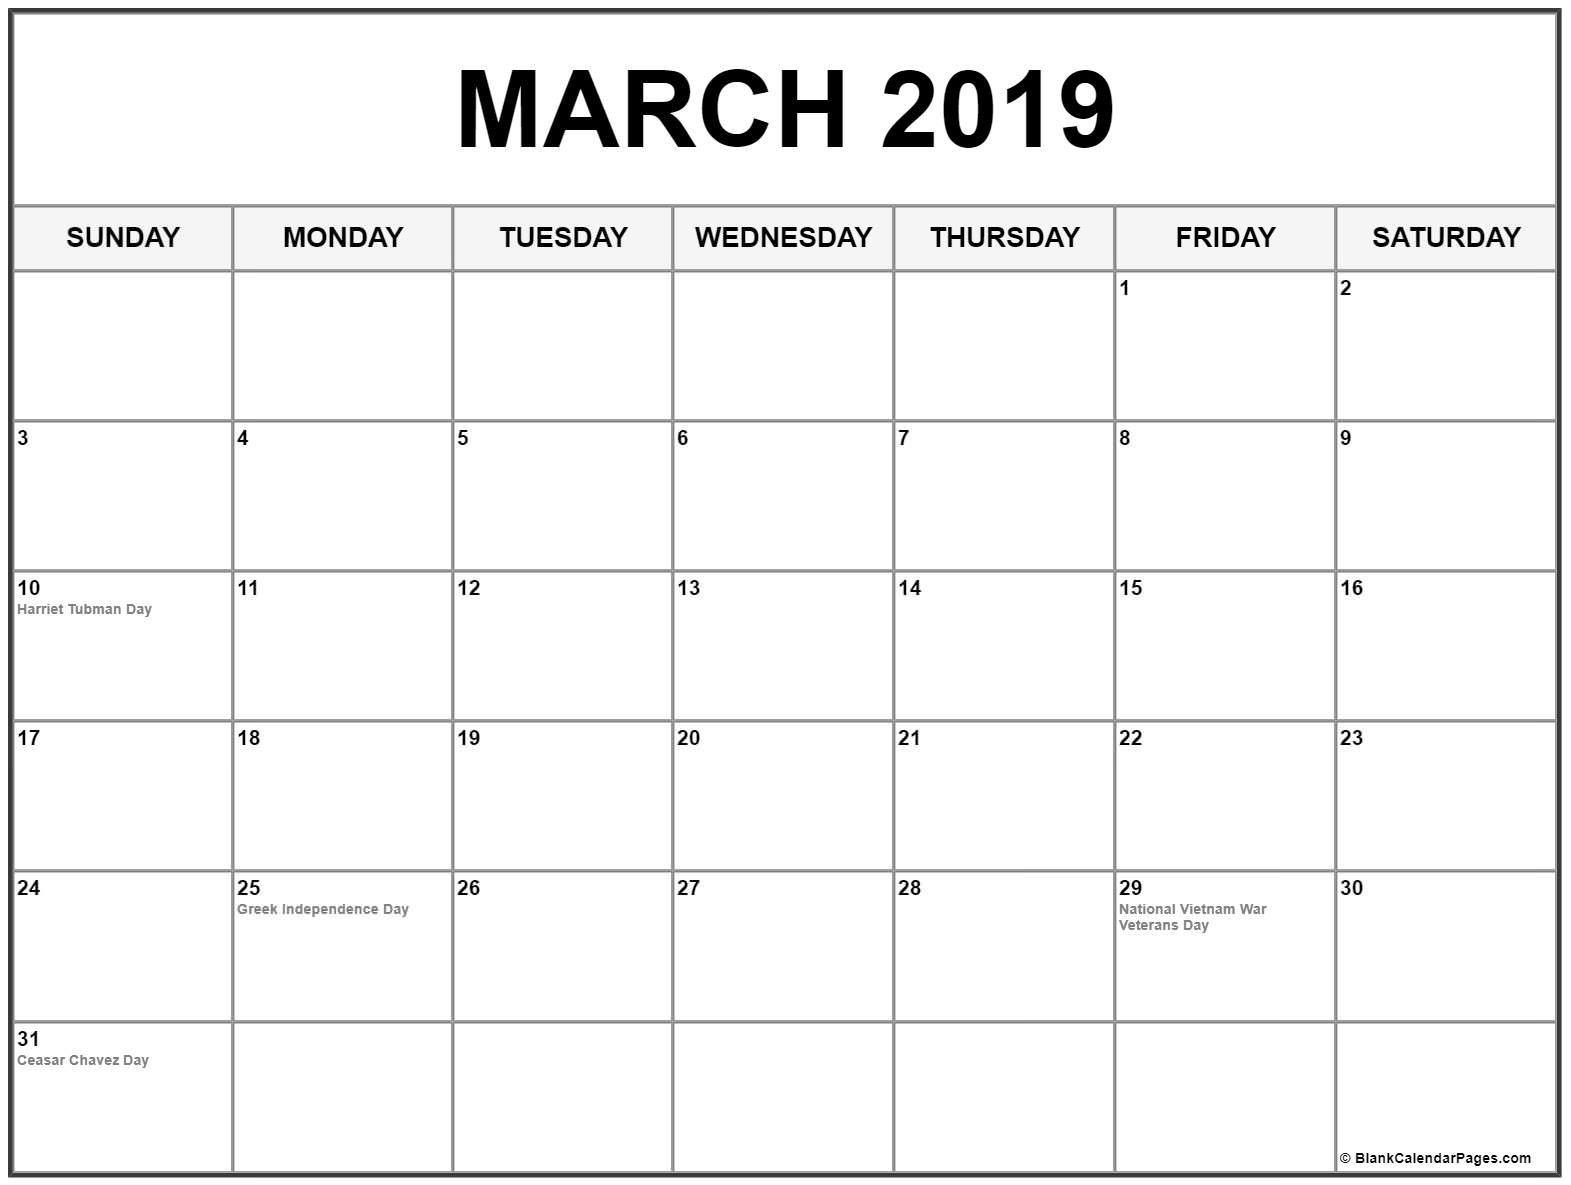 Blank Calendar March 2019 Printable   250+ March 2019-Us Printable Blank Calendars